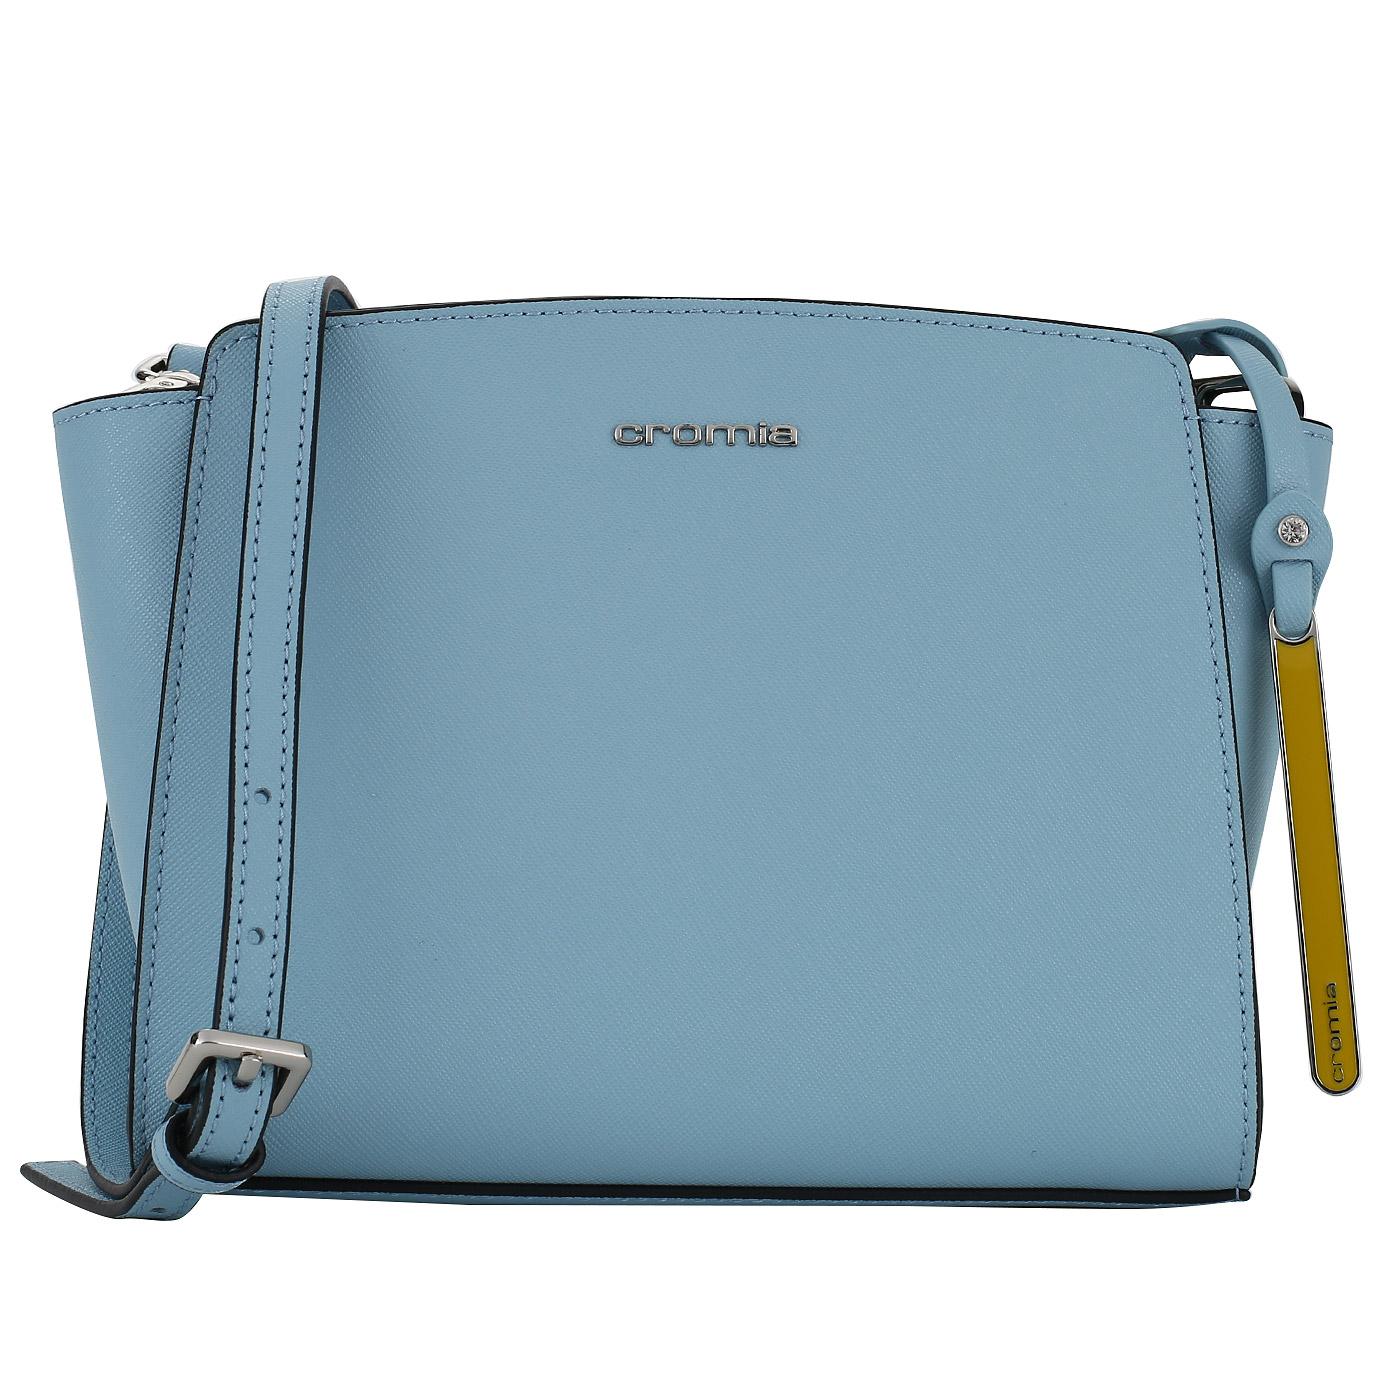 47003743d7e4 Голубая сафьяновая сумочка Cromia Perla 1403597_azzurro ...